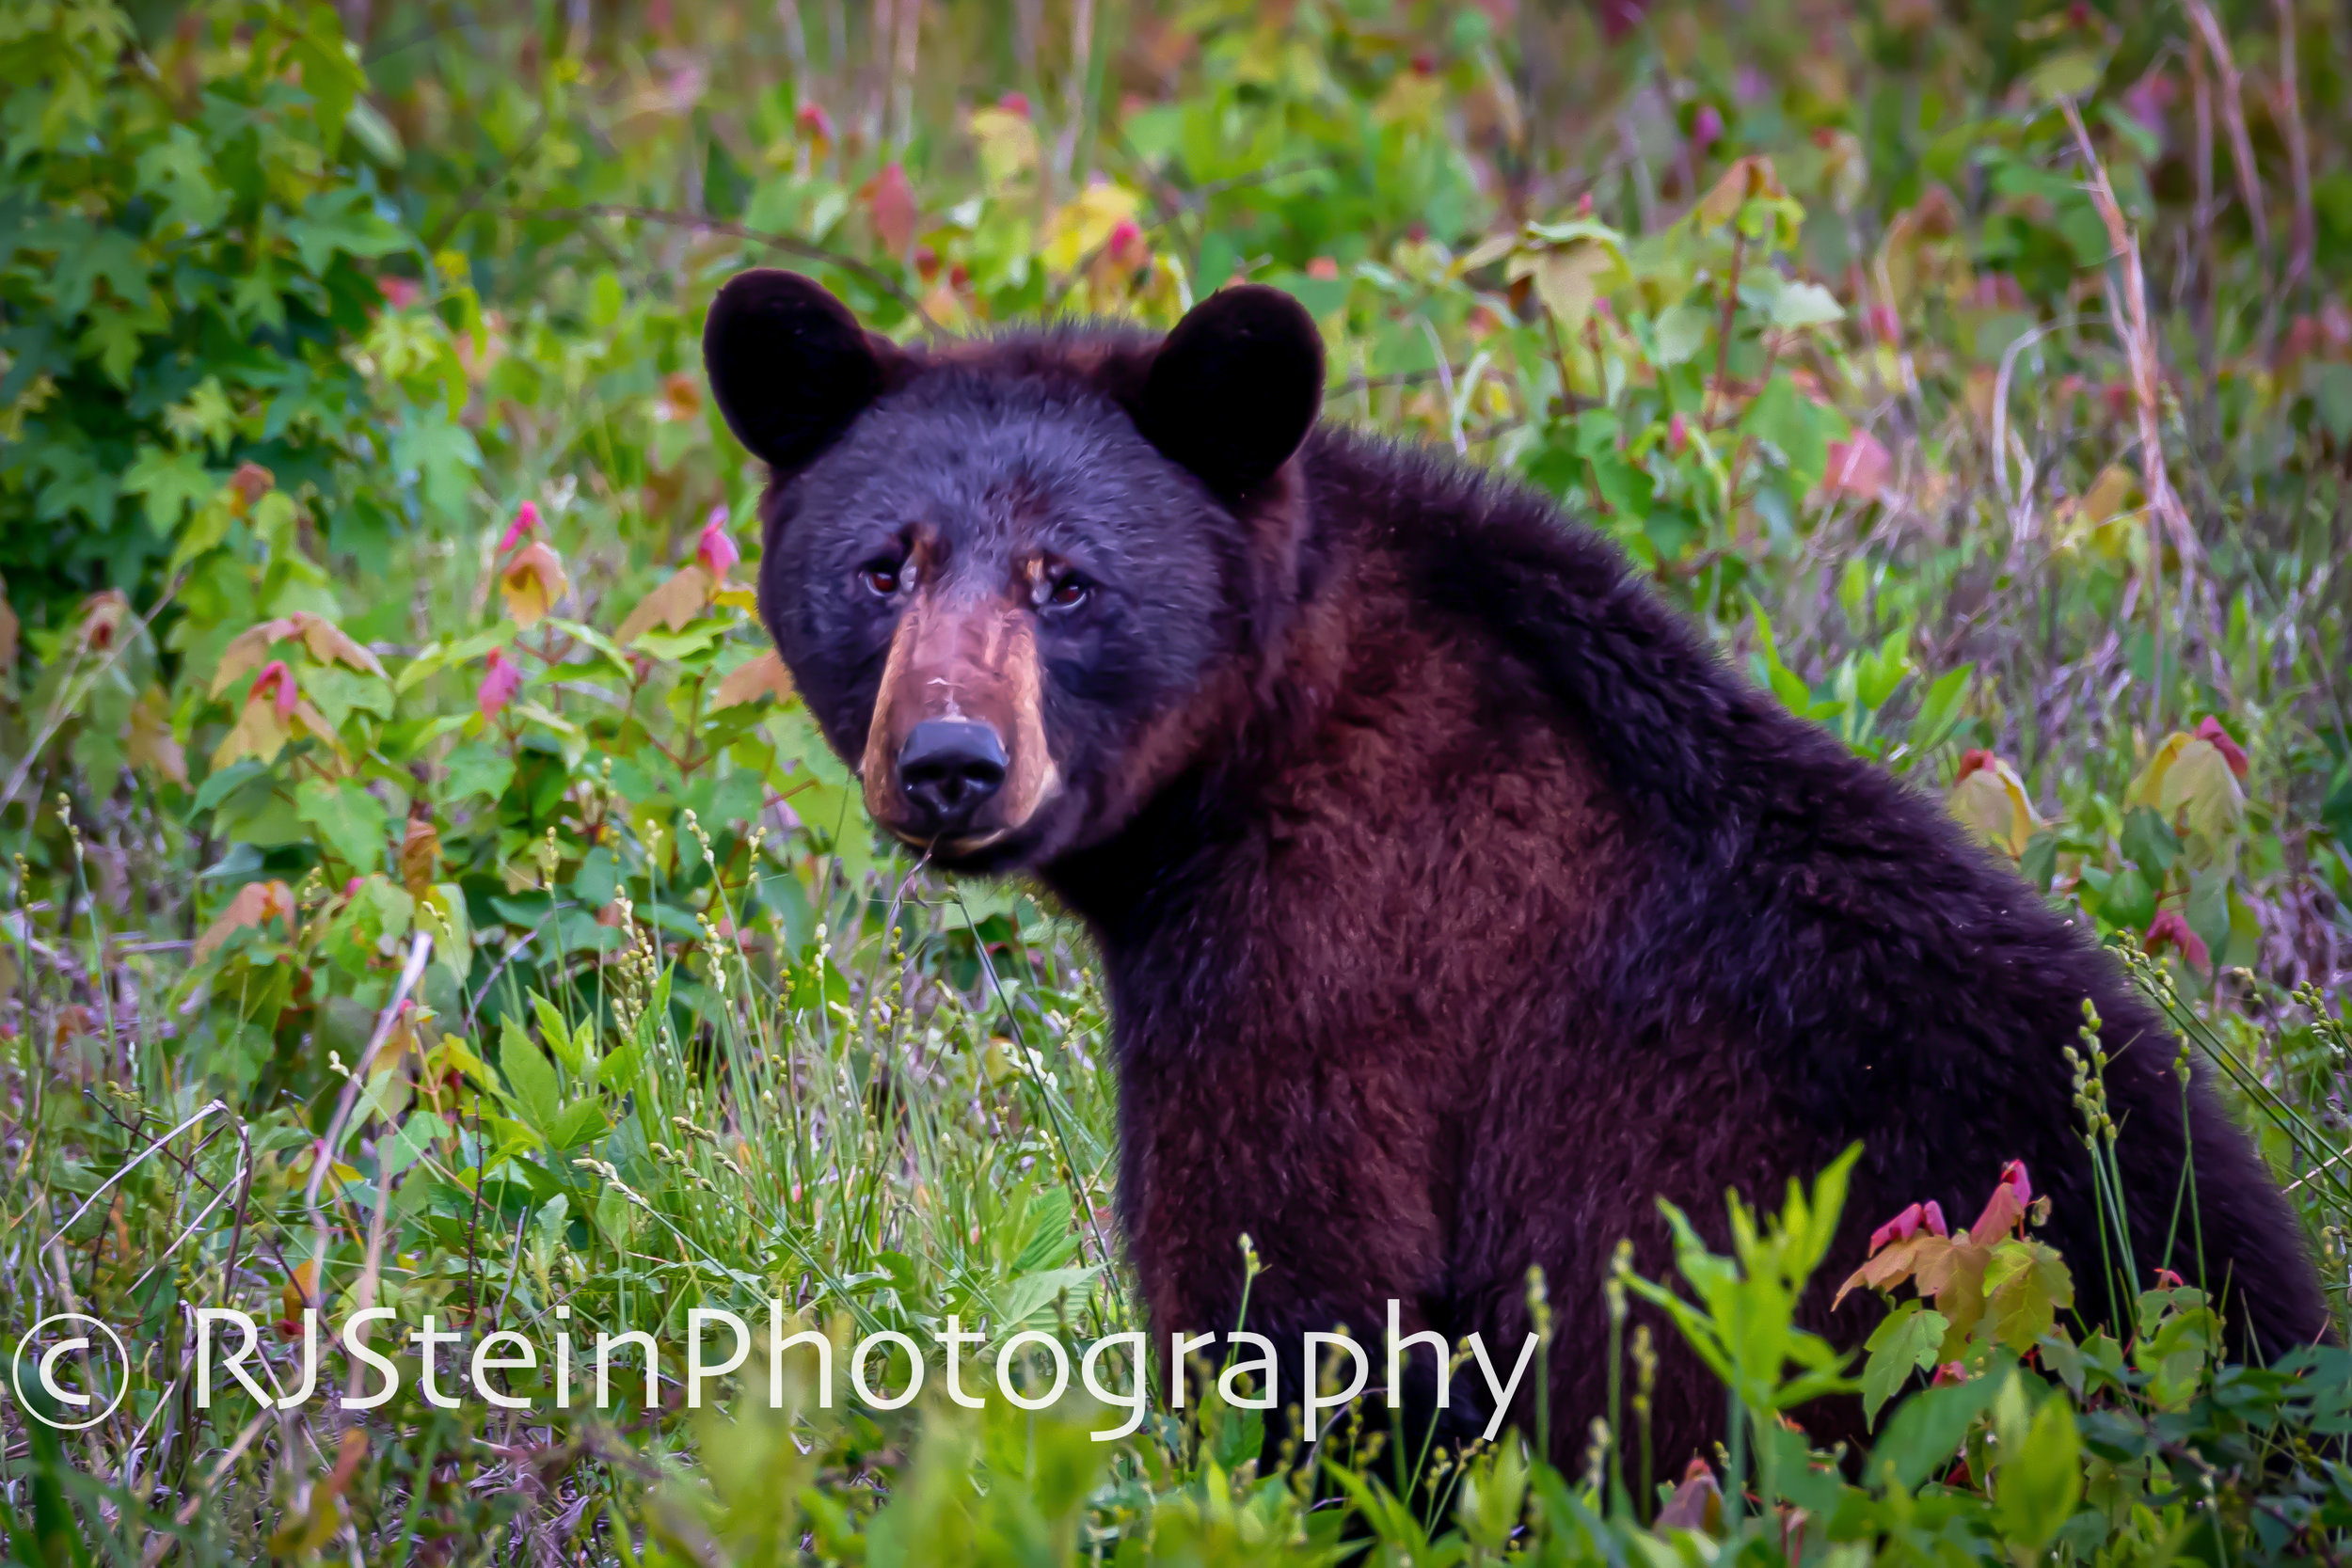 black bear in a field, north carolina, 2019